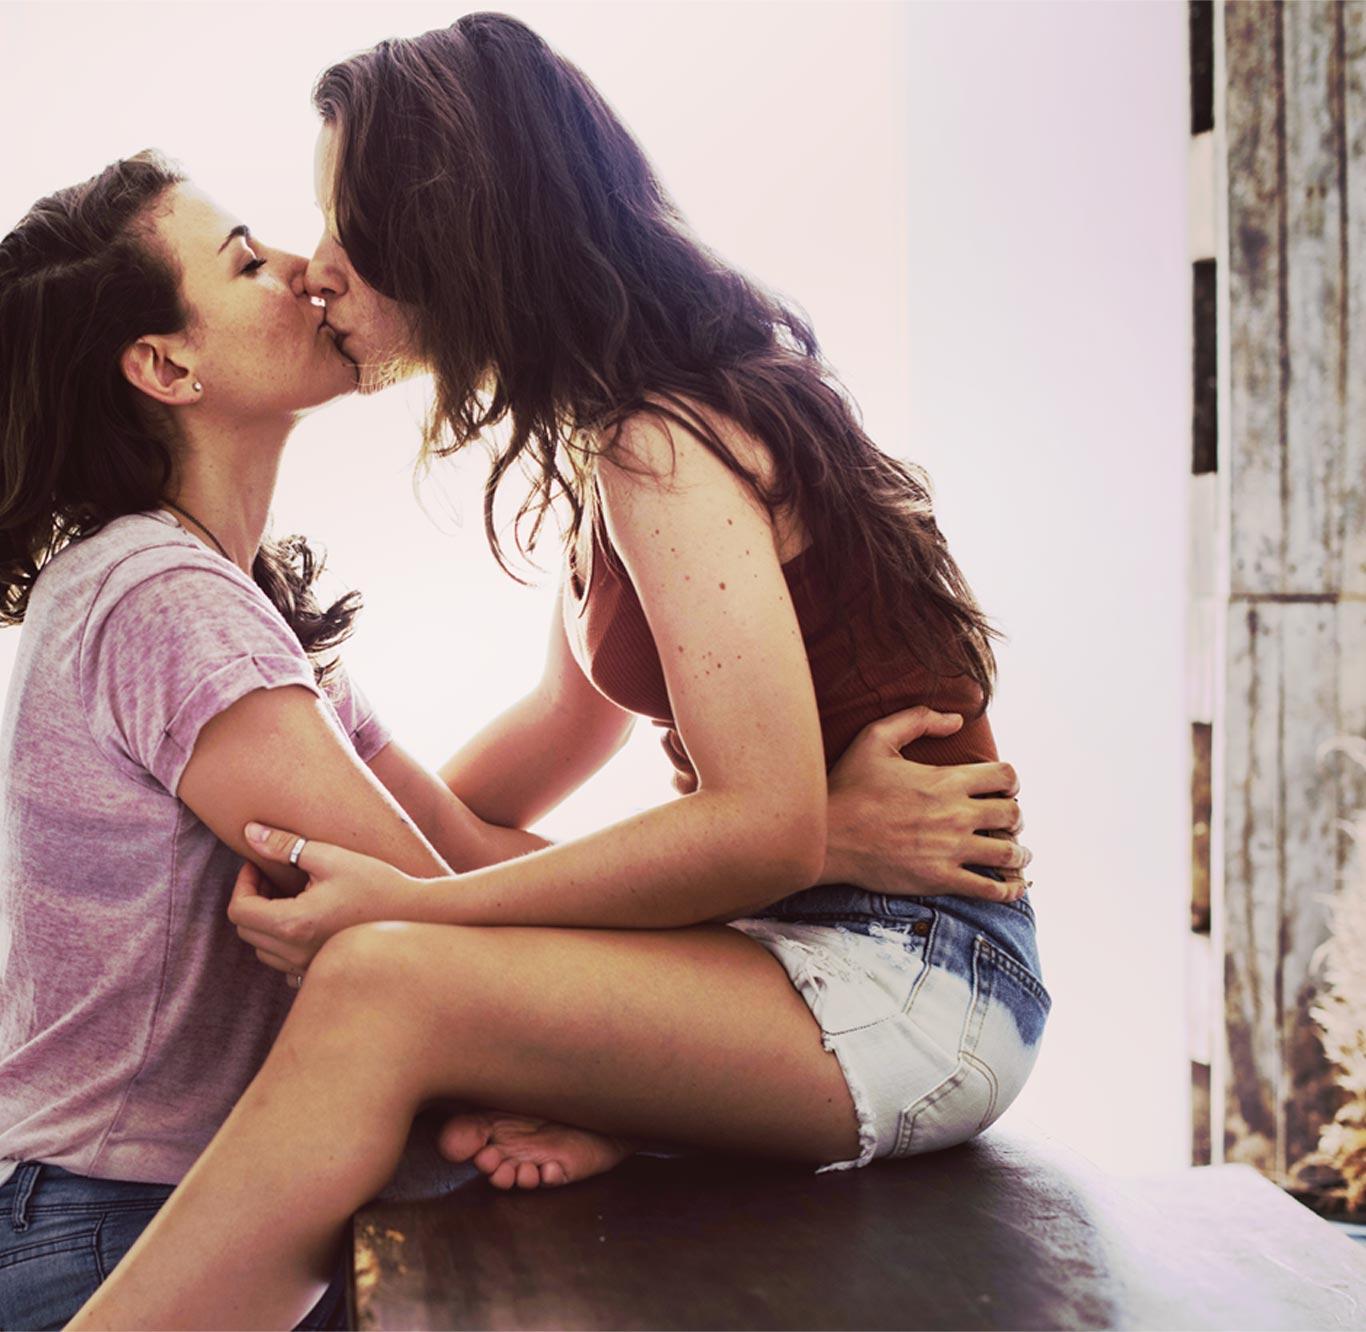 Lesbian Couple Kissing